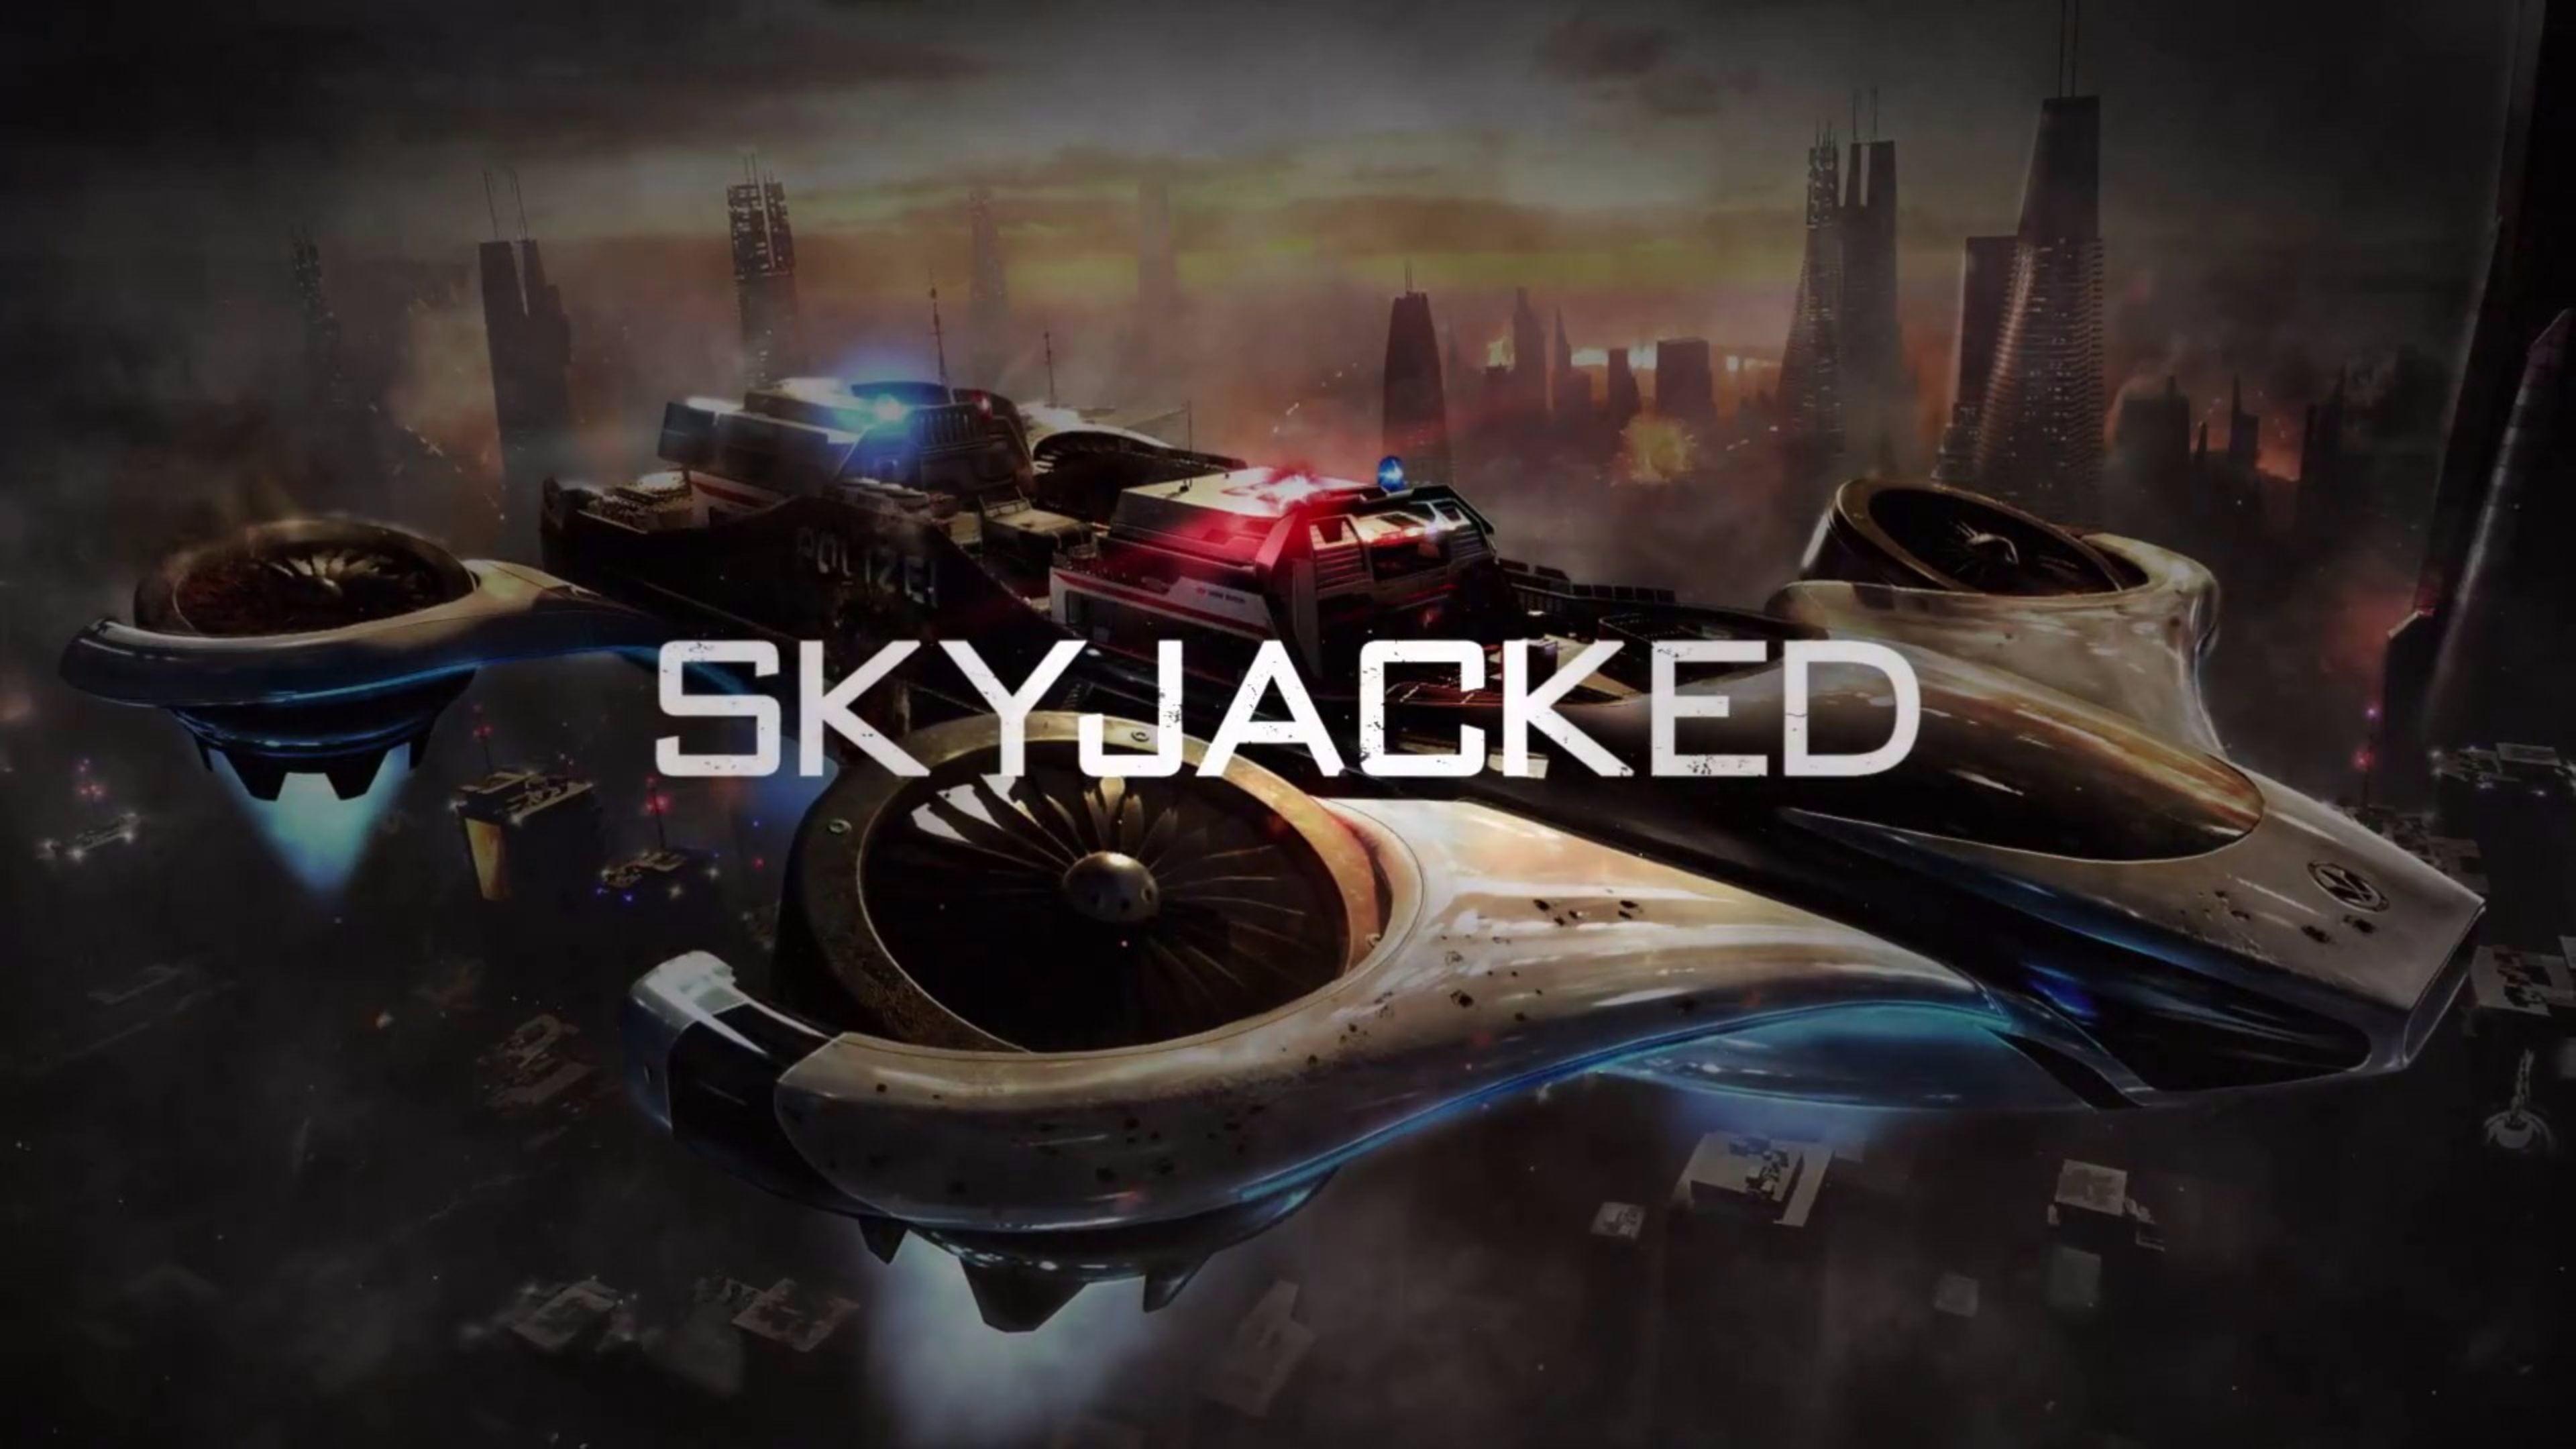 Skyjacked 2016 Call of Duty Black Ops 3 4K Wallpaper